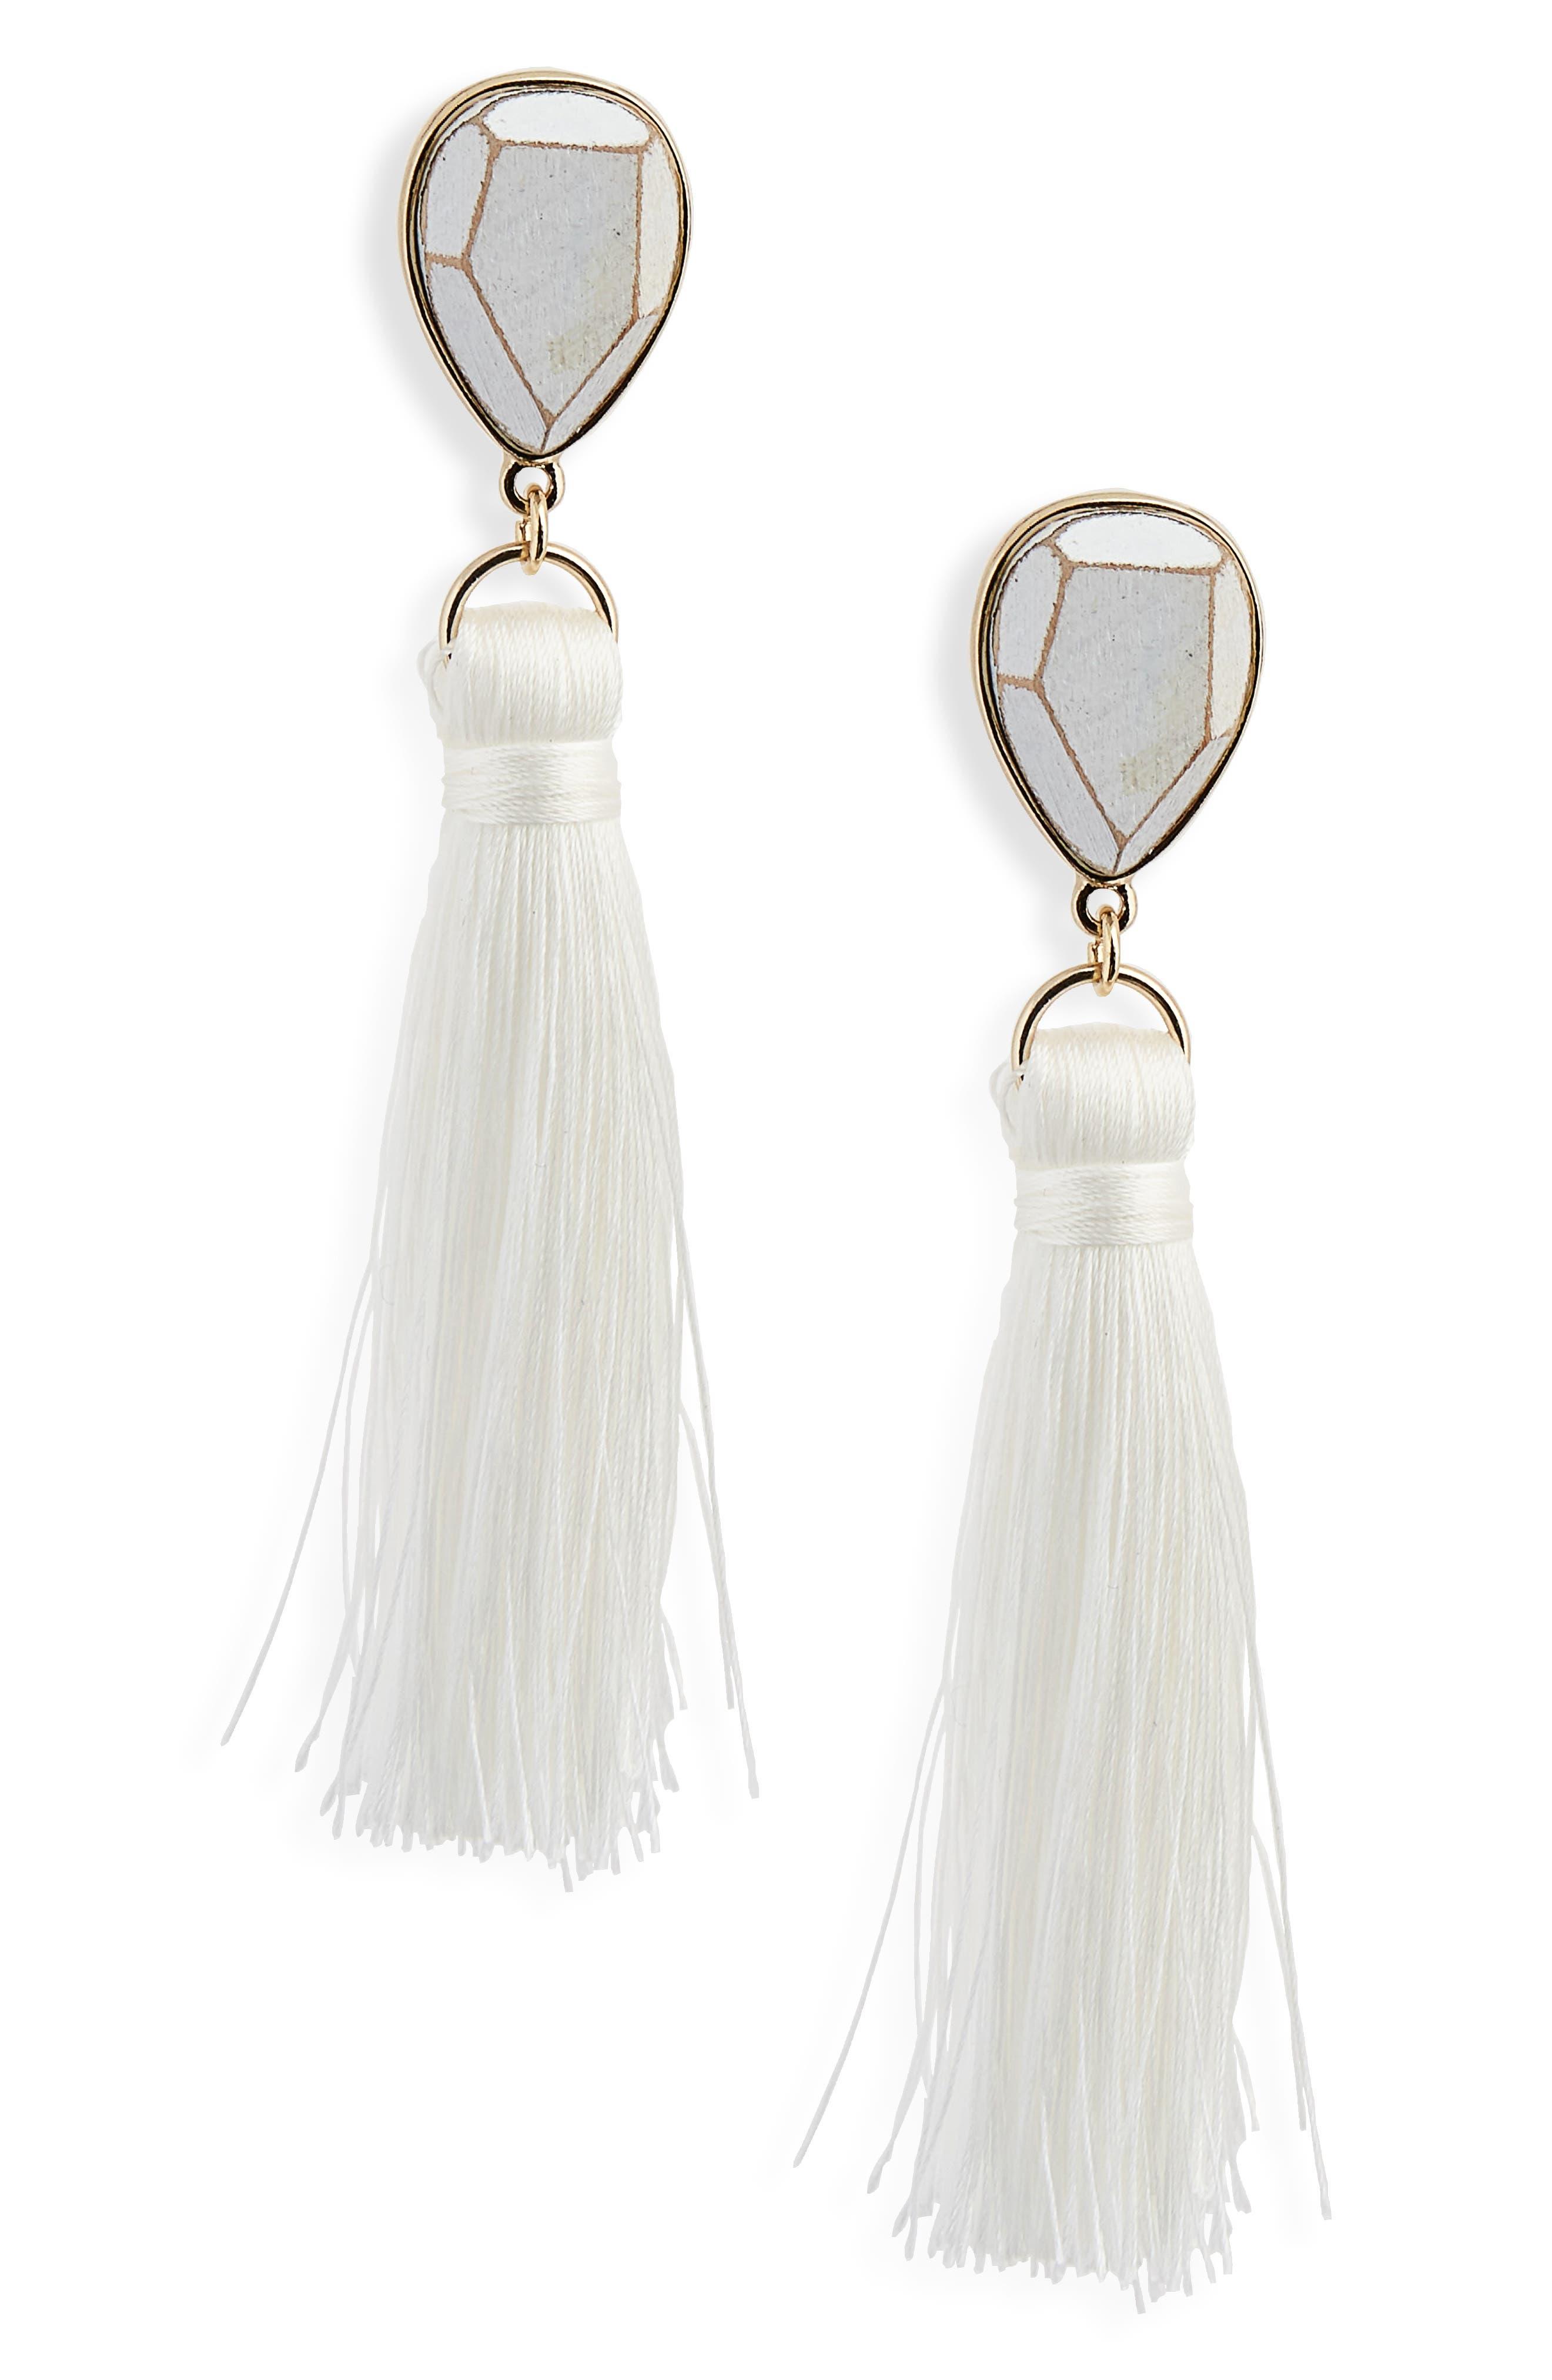 Wood Tassel Drop Earrings,                         Main,                         color, White